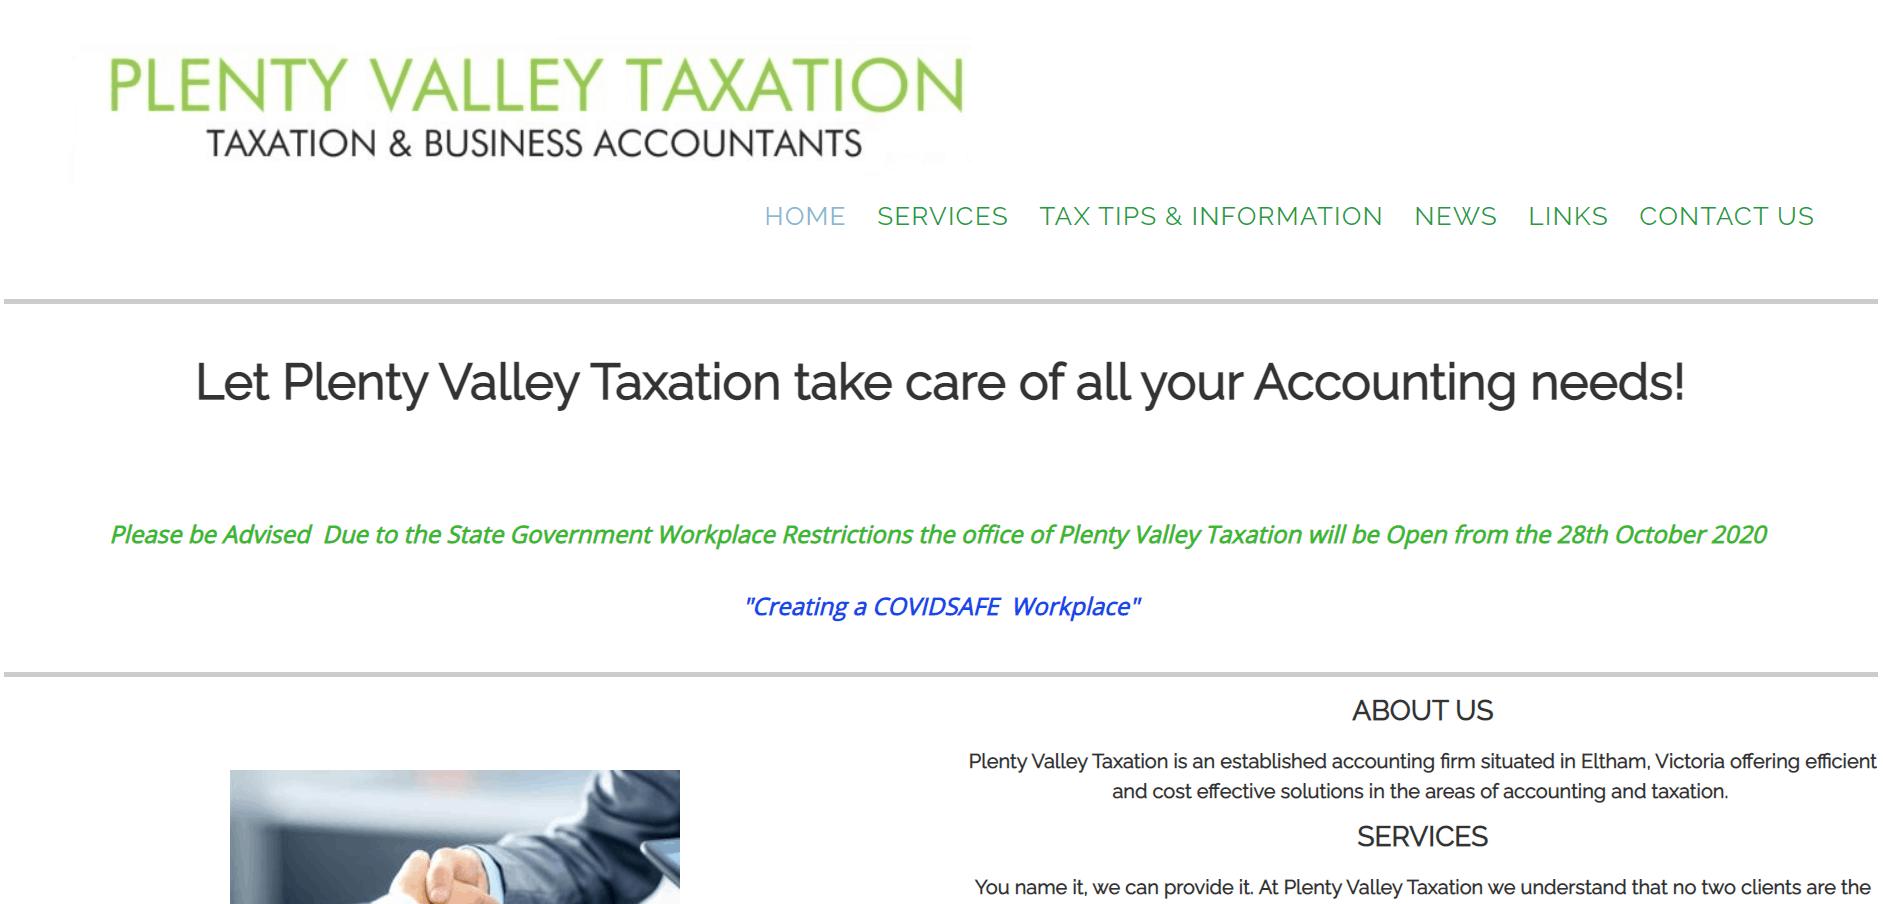 Plenty Valley Taxation